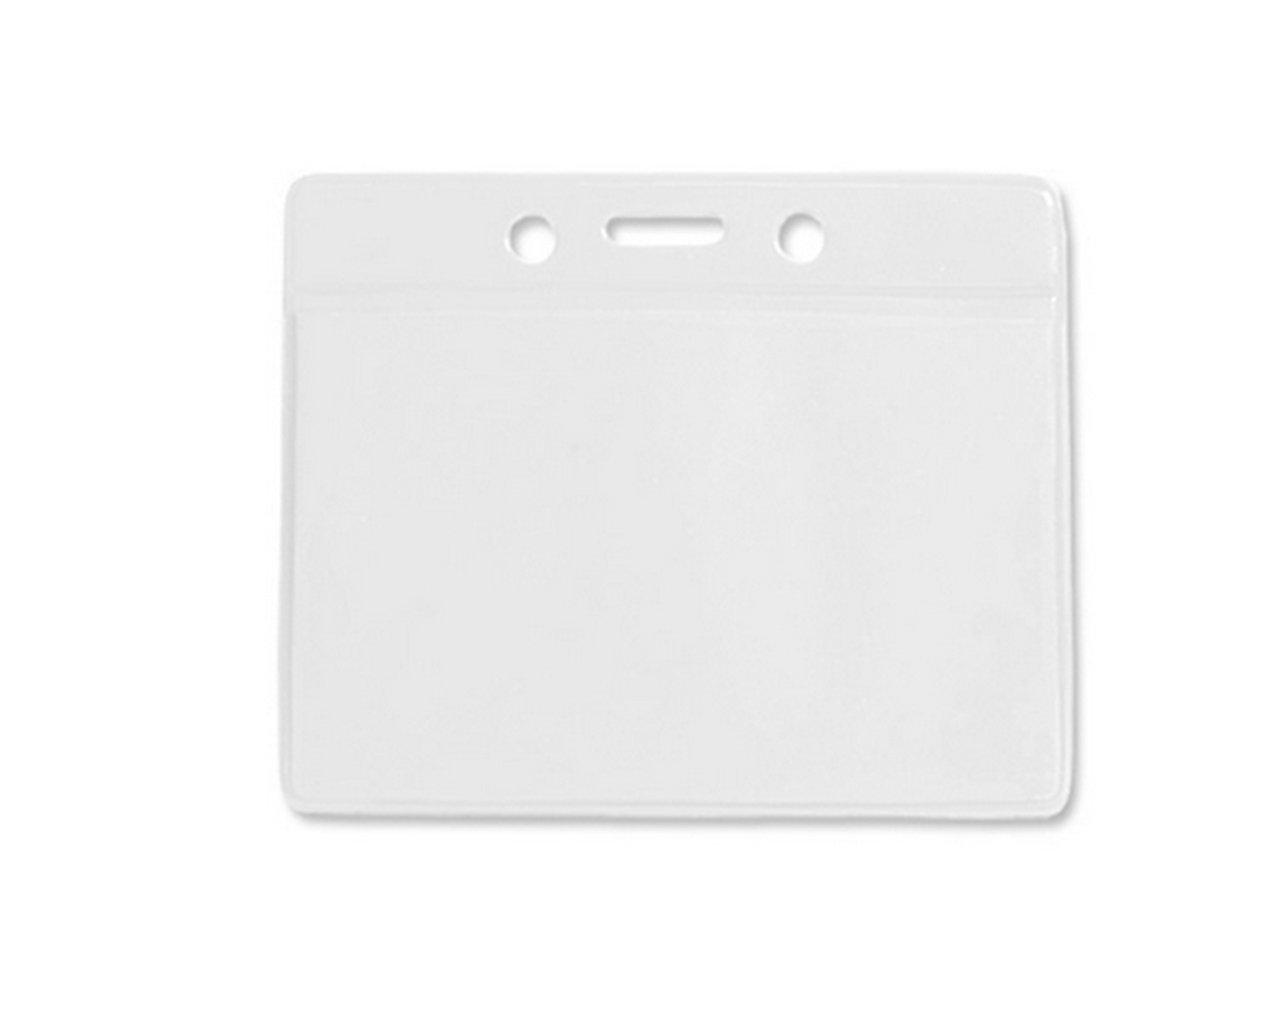 ID Card It ID Card Holder PVC Plastic Pocket Wallet Holder 86x54mm - 1